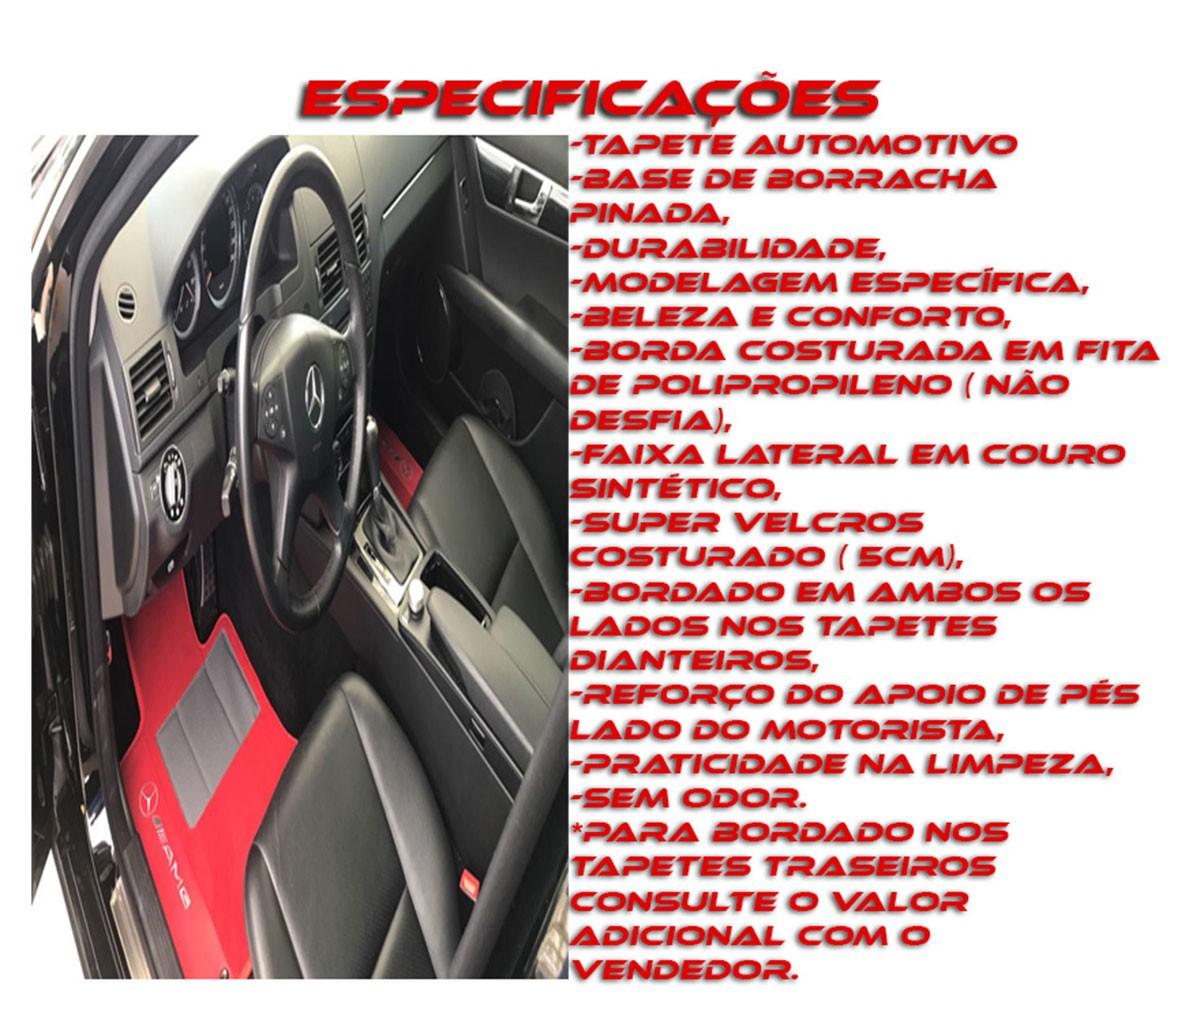 Tapete Carpete Ford Ecosport Luxo  Base Pinada